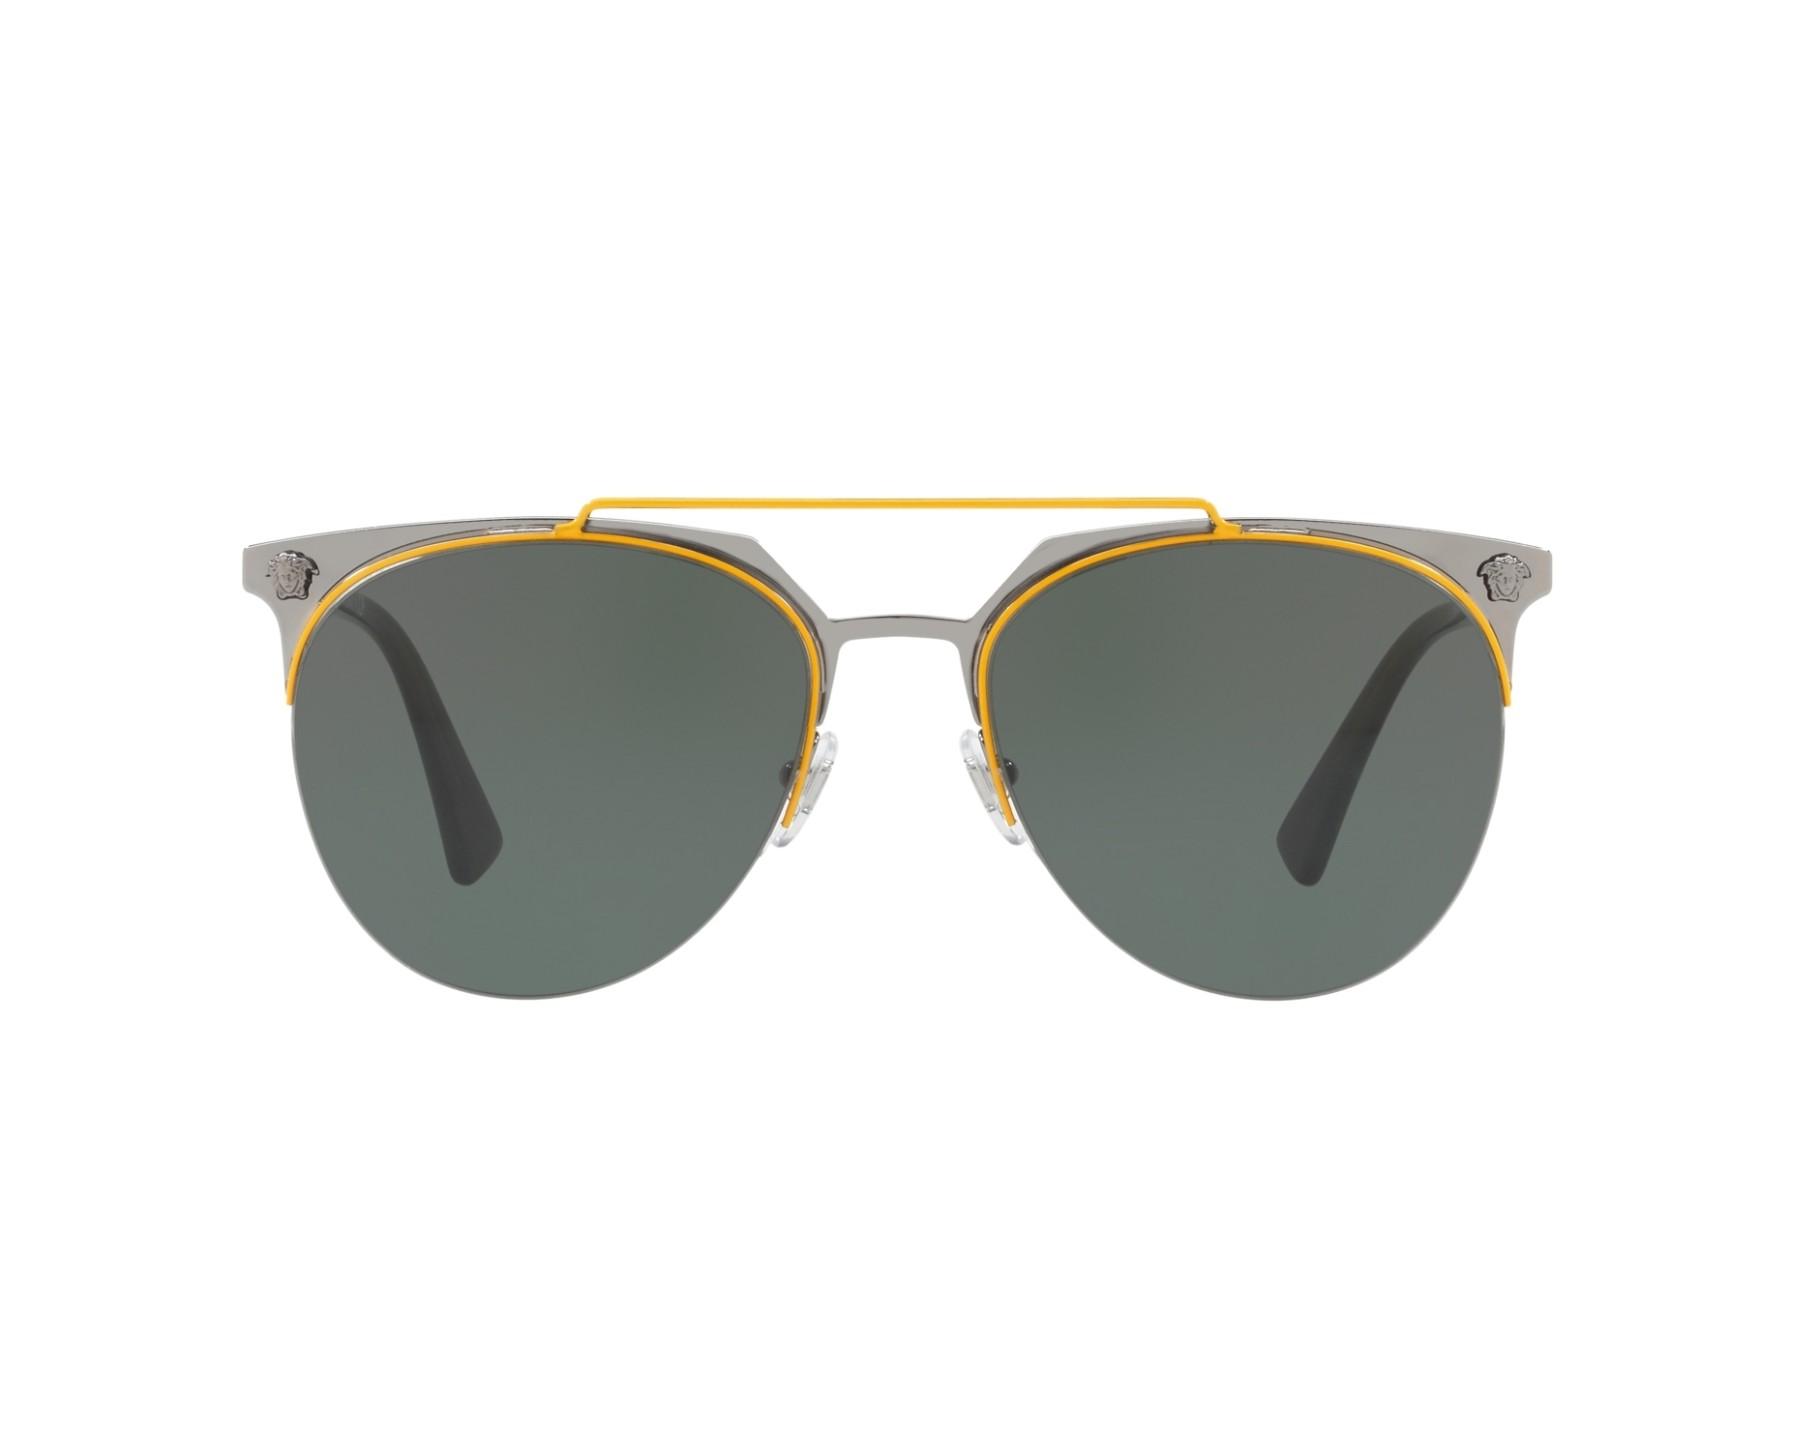 lunettes de soleil versace ve 2181 100171 gunmetal avec des verres gris vert. Black Bedroom Furniture Sets. Home Design Ideas